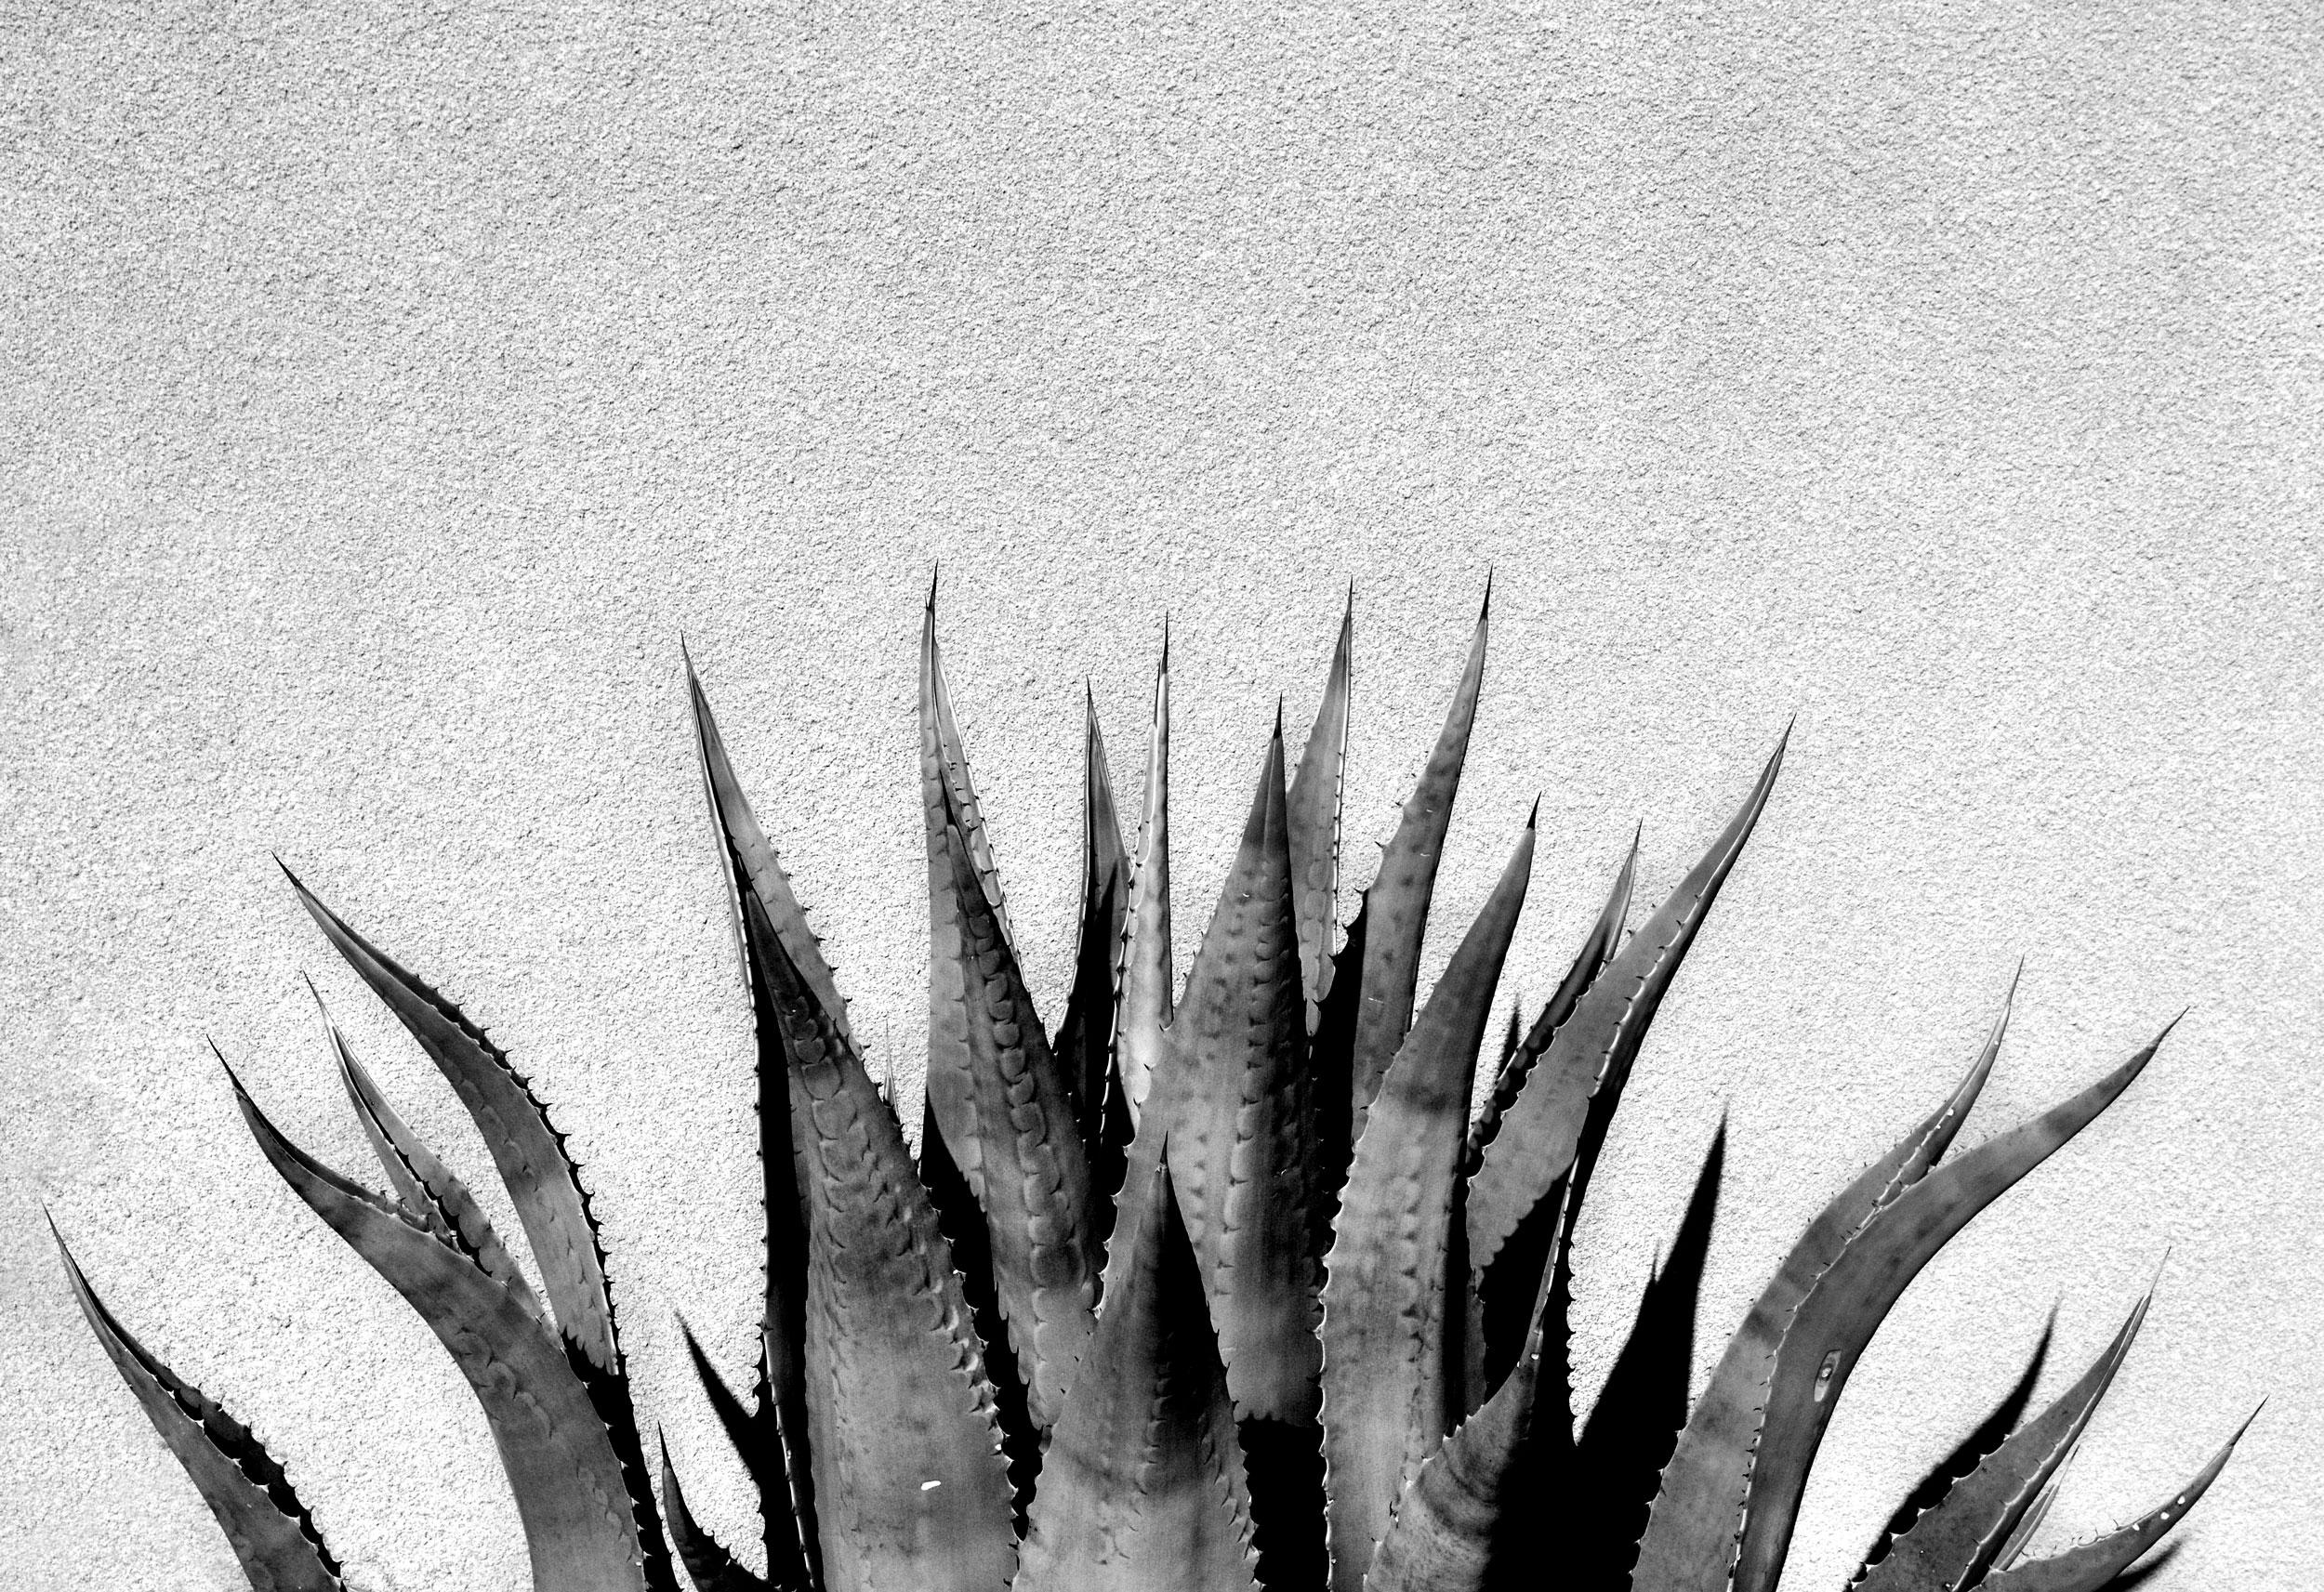 Summer-Big-Cactus.jpg